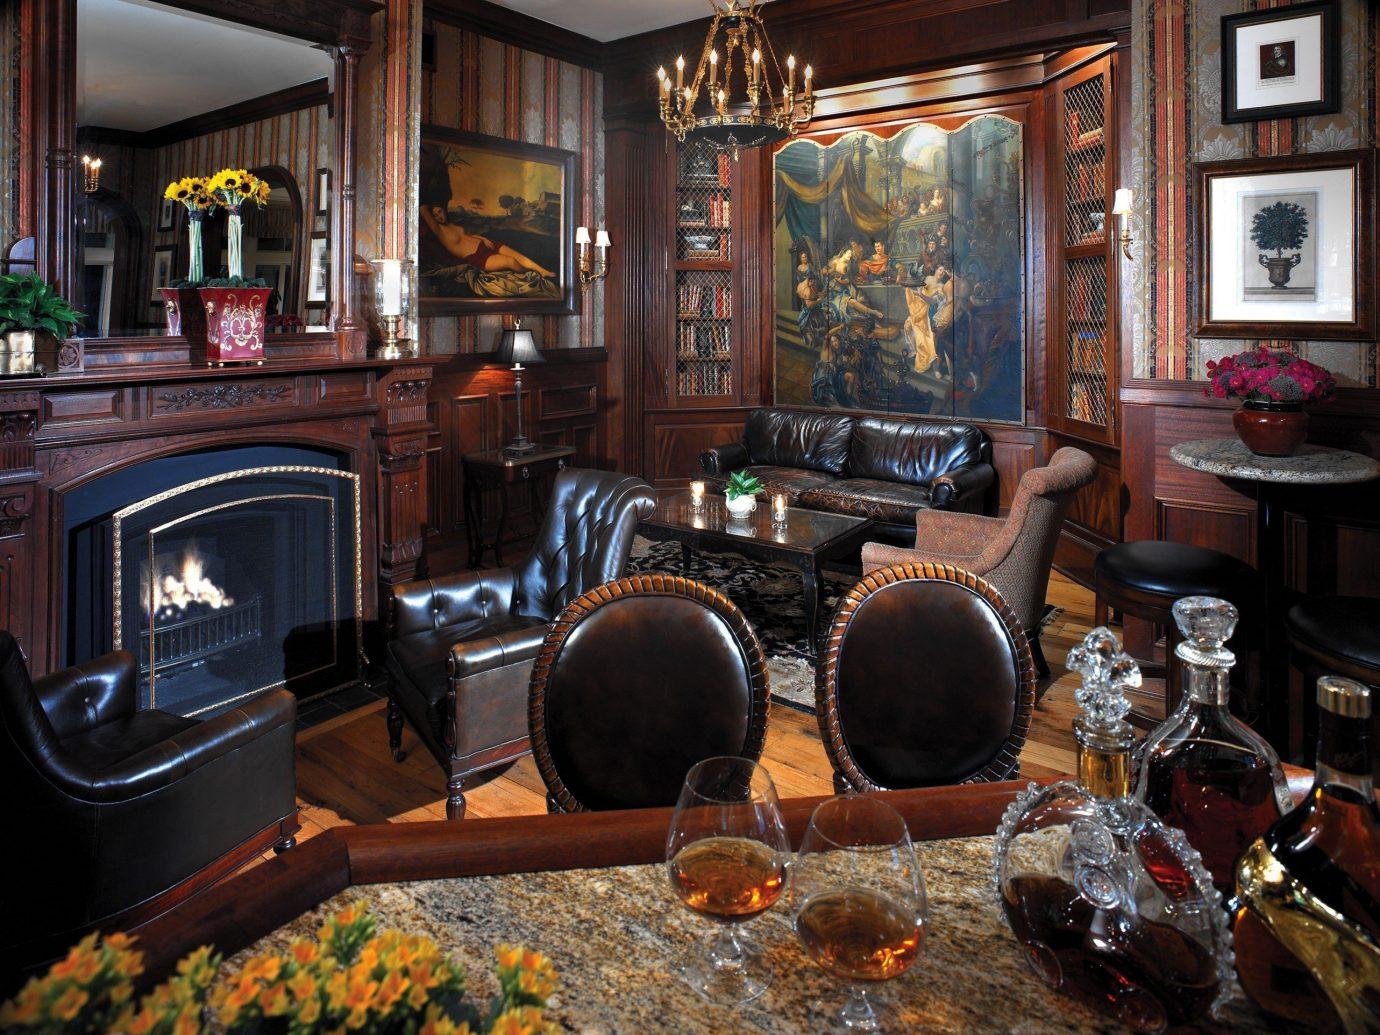 Hotels indoor Living room Bar restaurant interior design estate meal Lobby furniture cluttered dining table